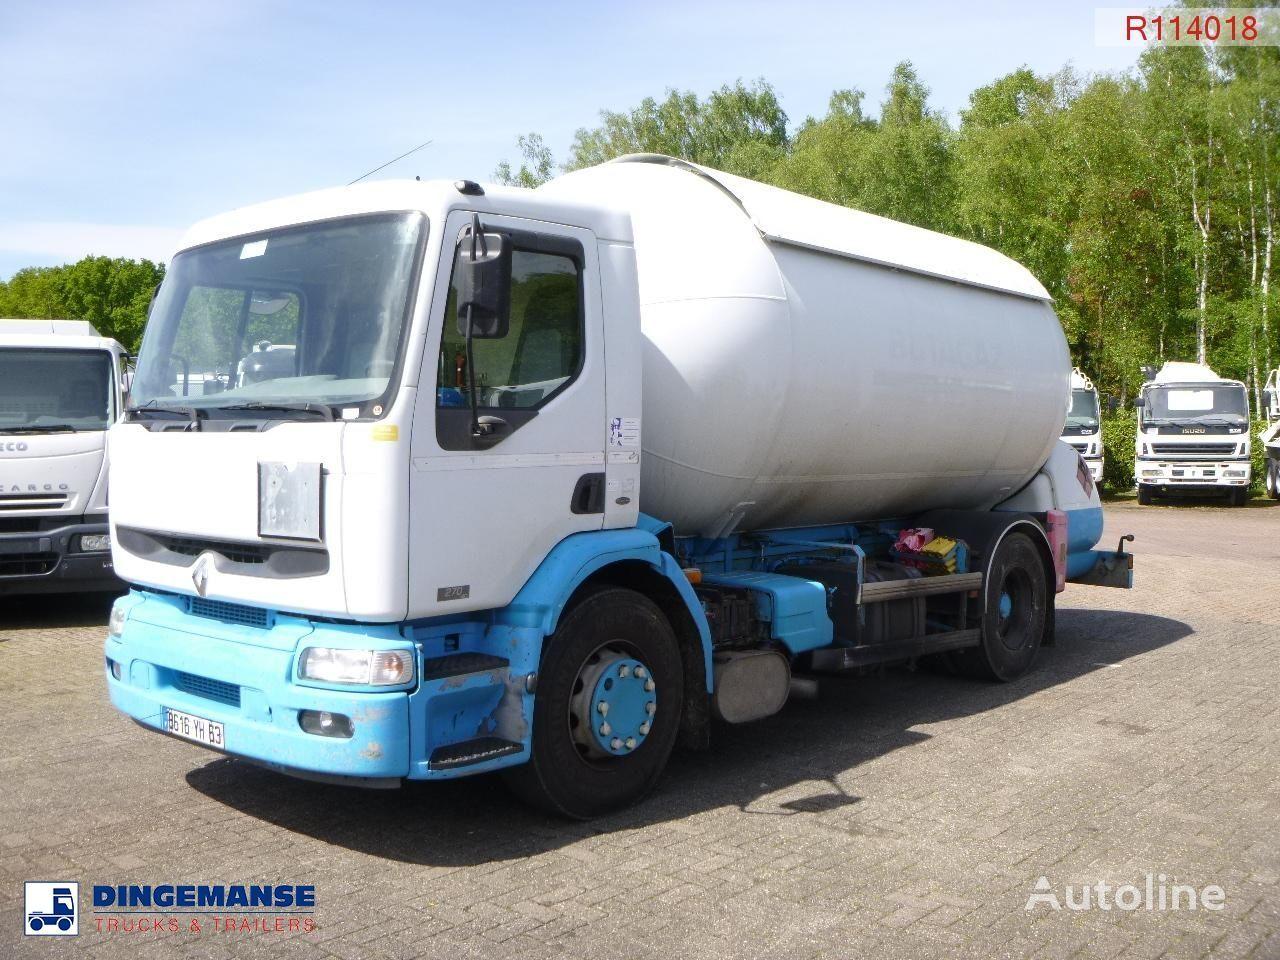 RENAULT Premium 270 4x2 gas tank 19.7 m3 kamion za transport gasa